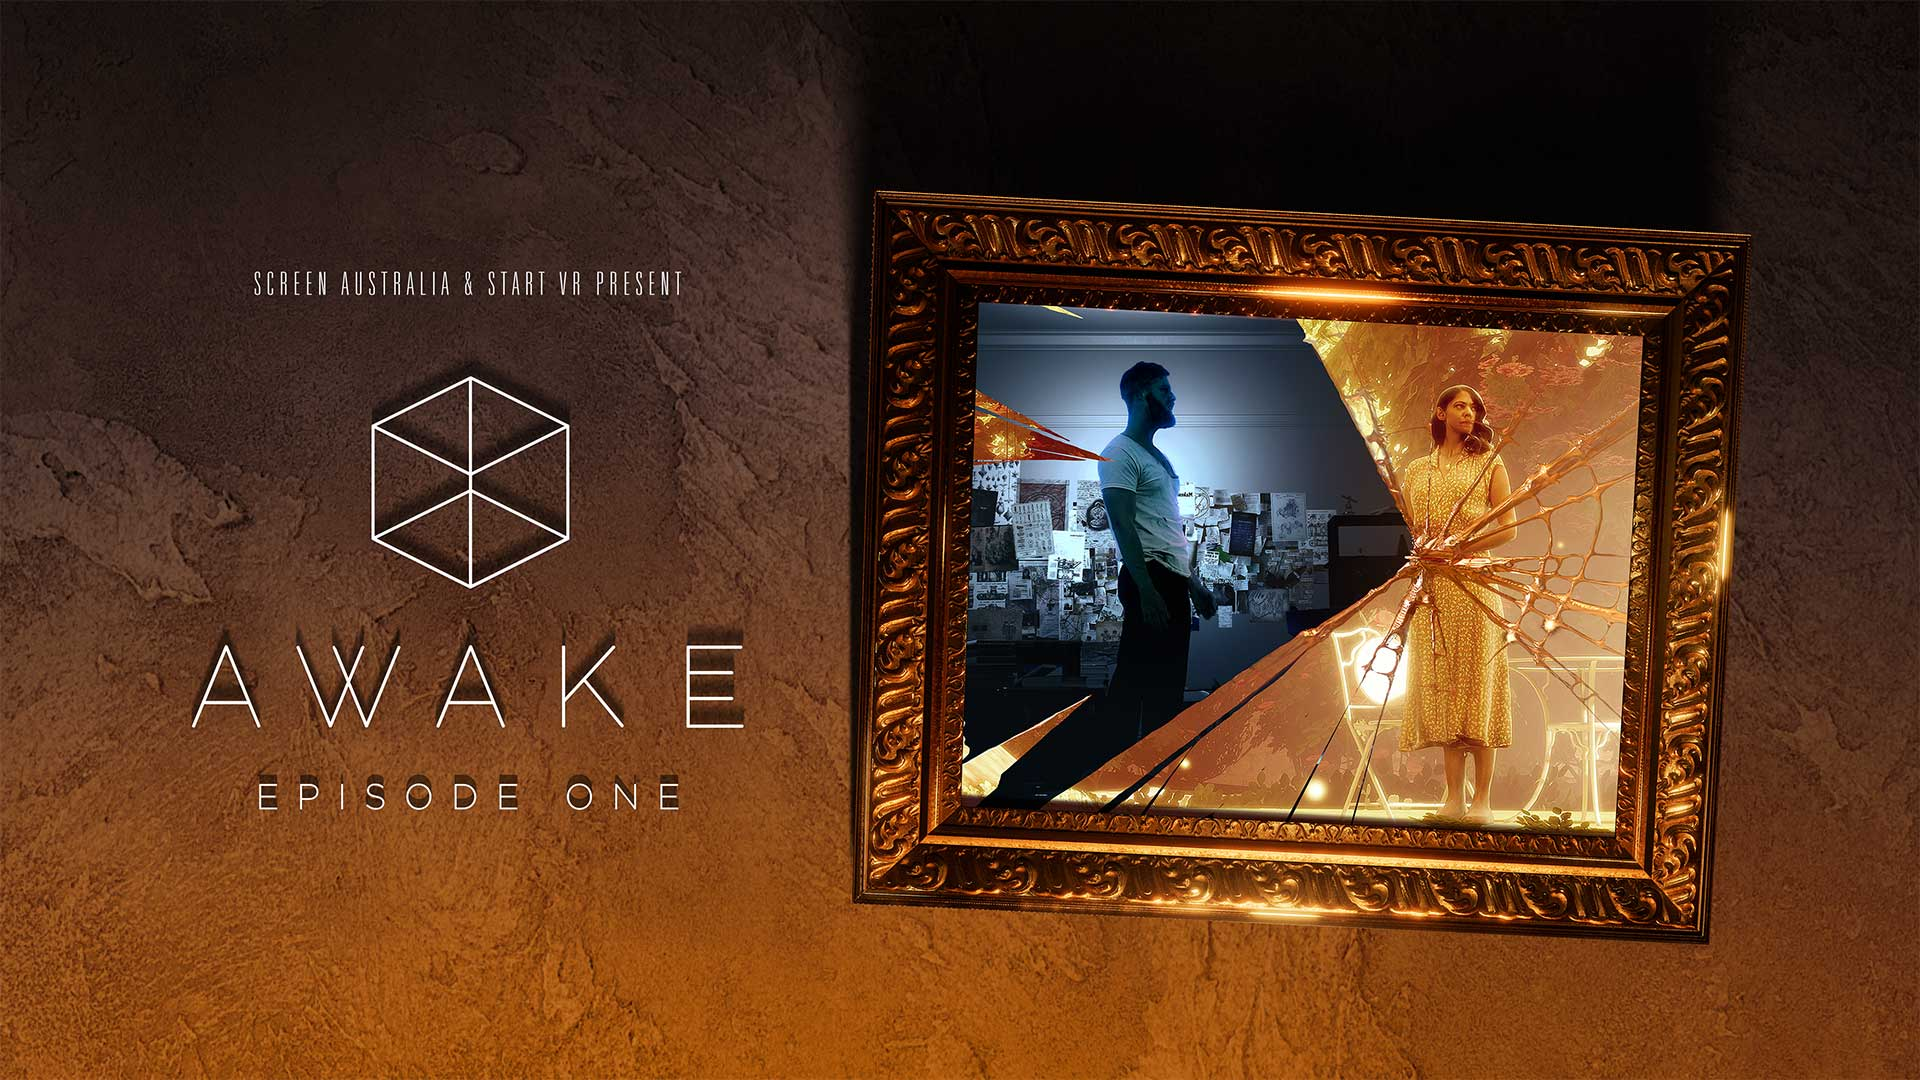 Awake: Episode One Poster (Horizontal)